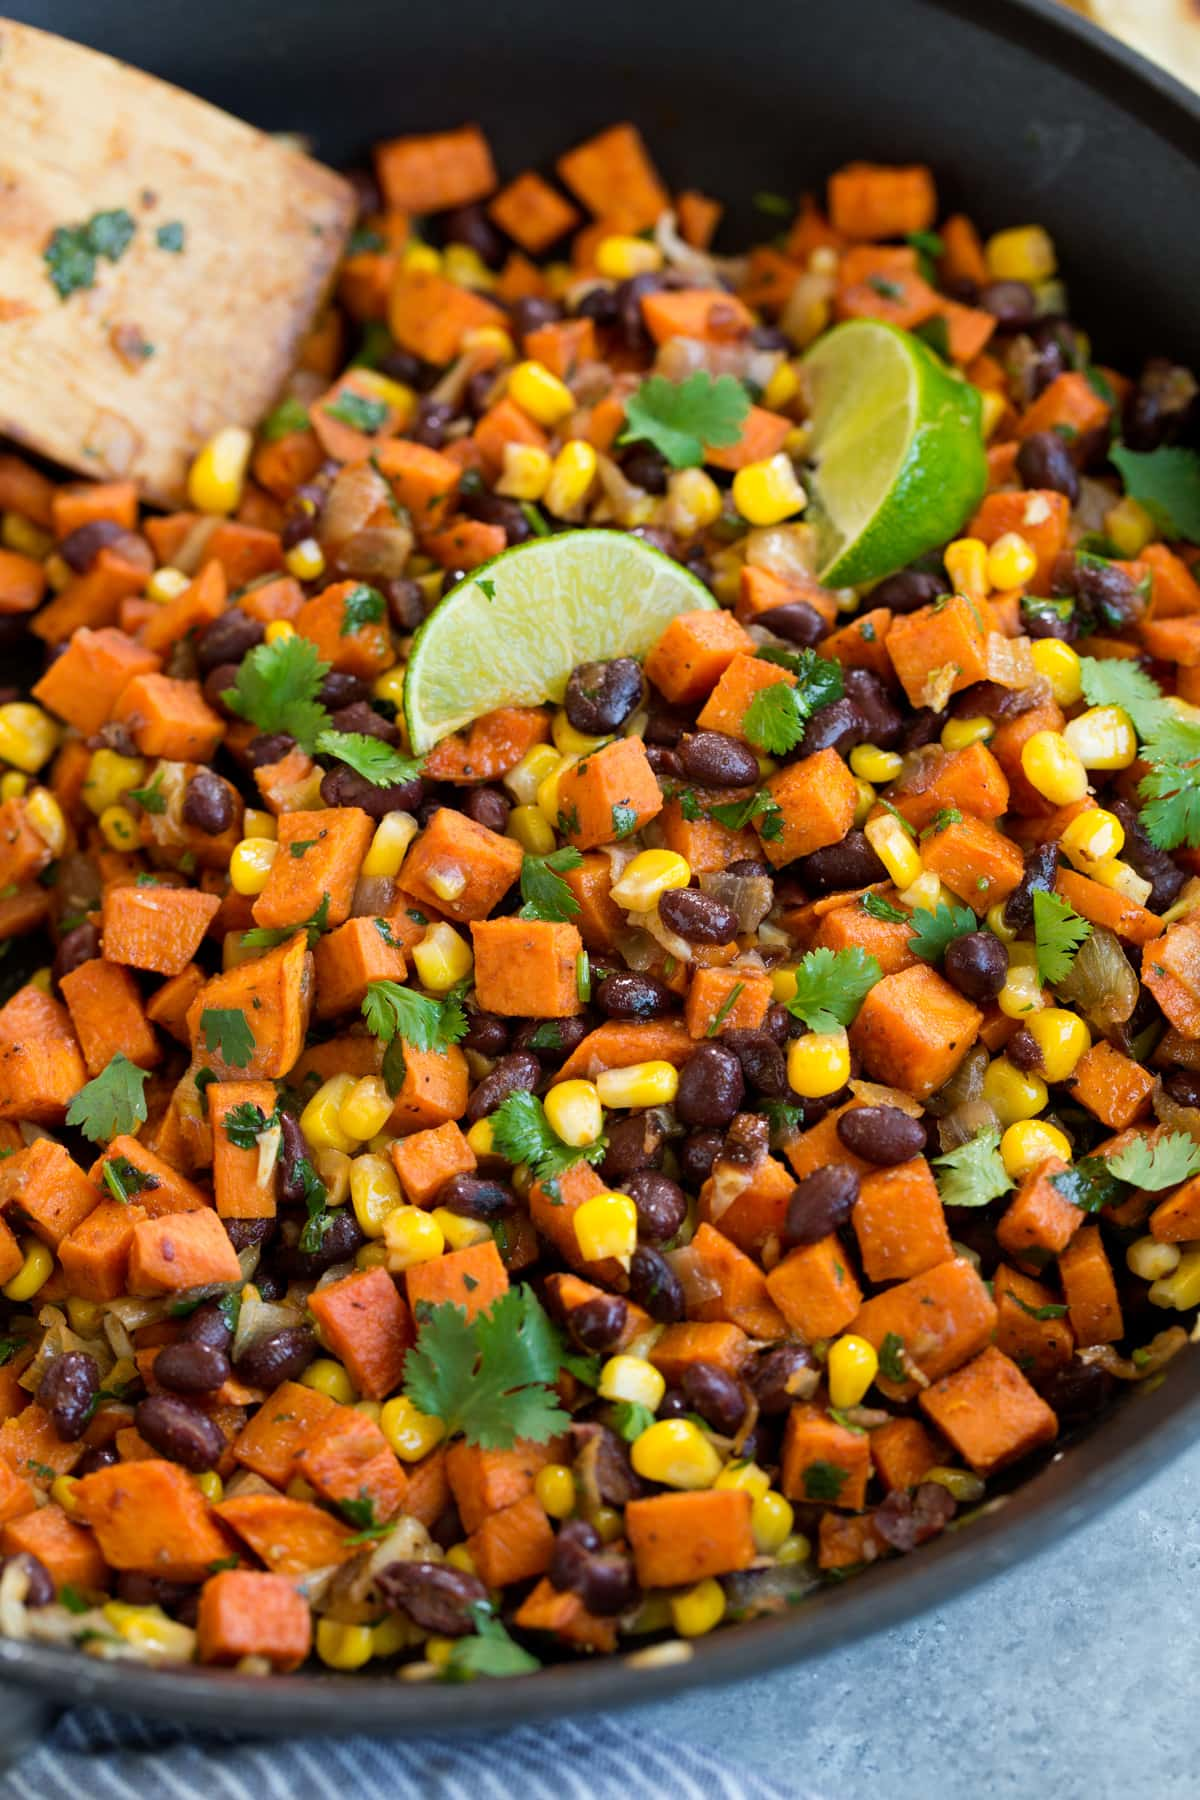 Healthy vegetarian taco filling mixture in skillet.